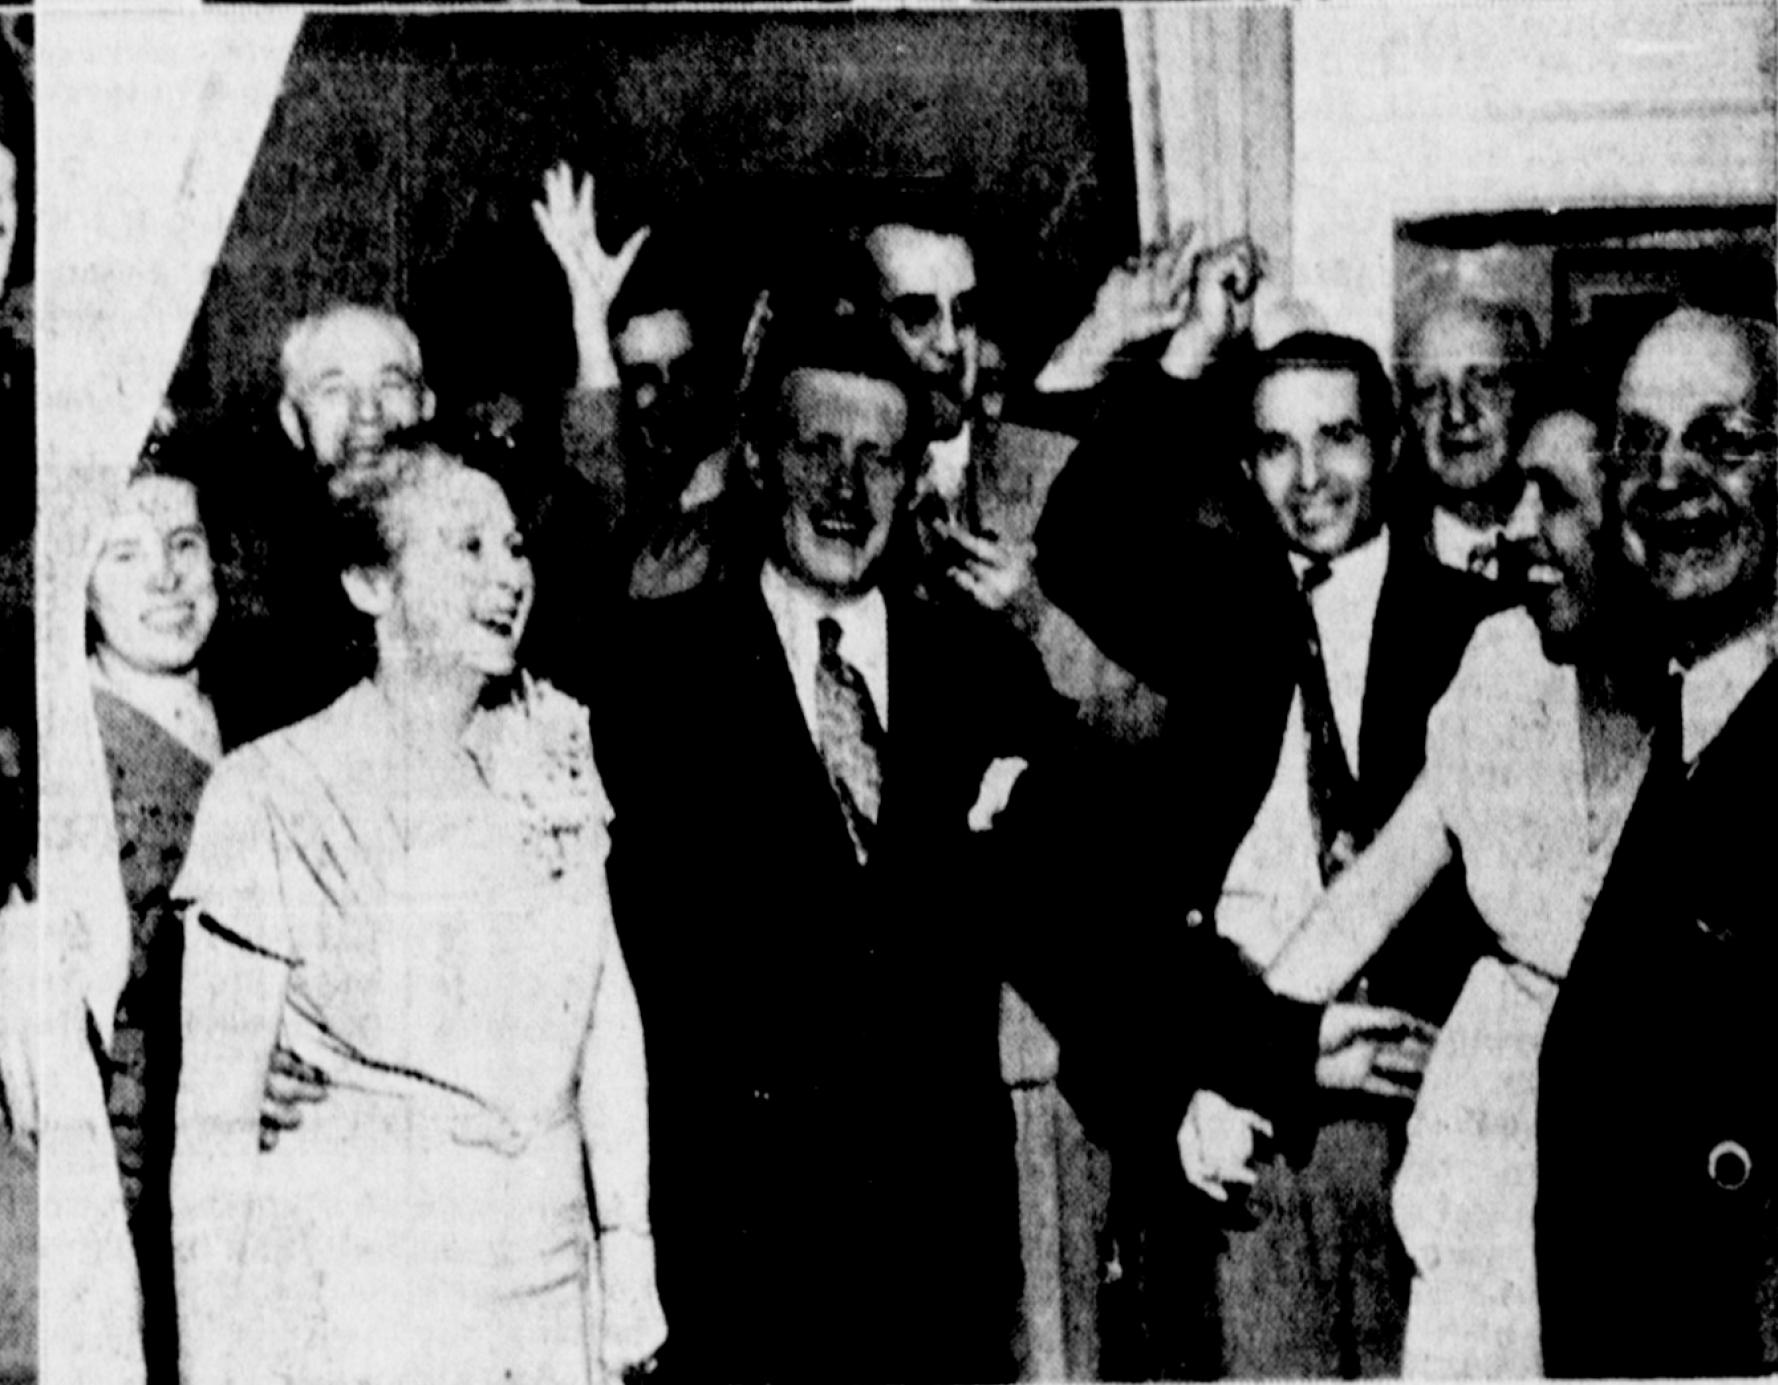 Mr. and Mrs. L Mutch (centre left)